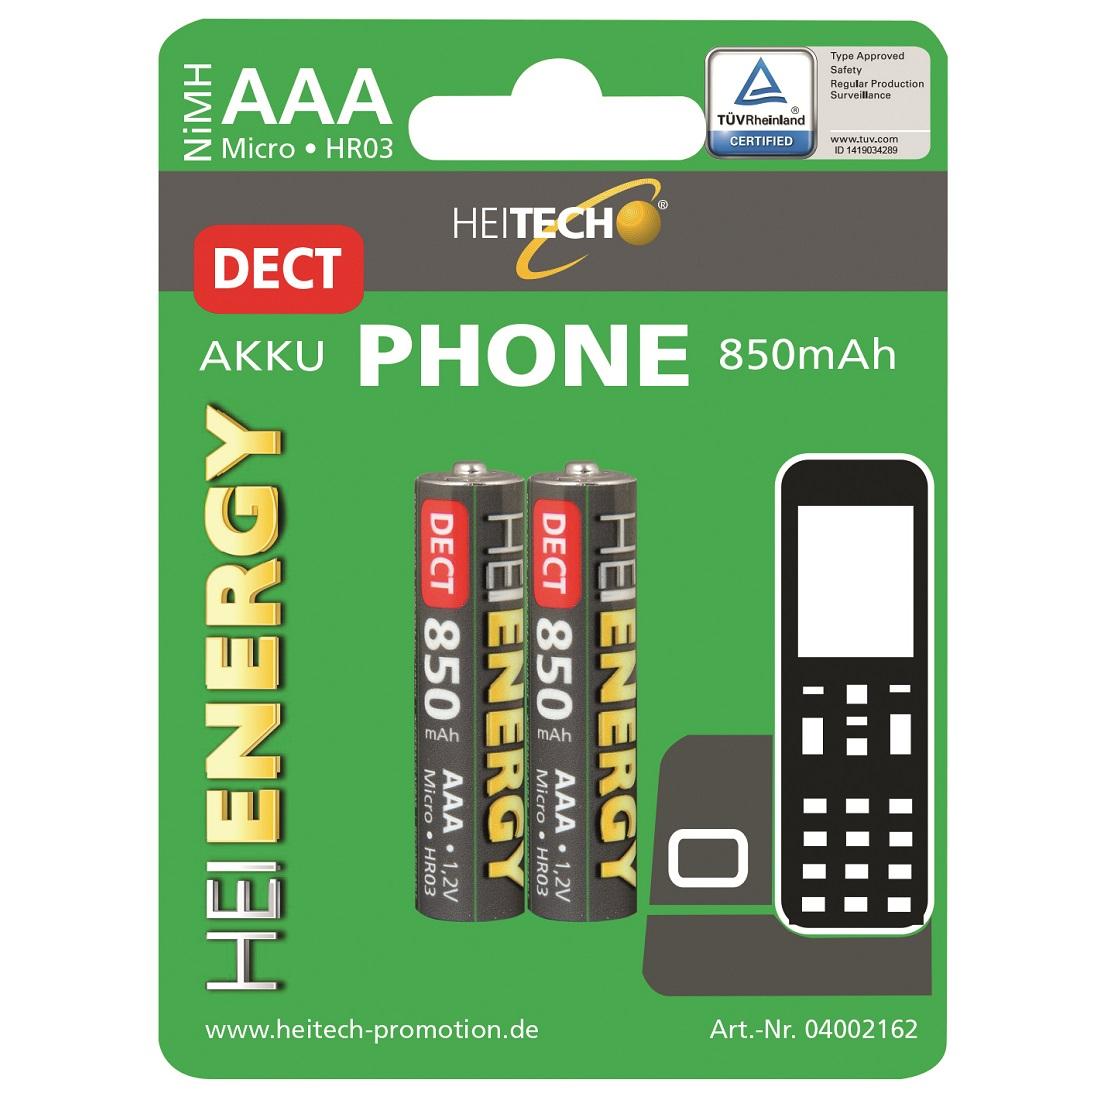 Heitech NiMH Akku 850 mAh für DECT Telefone Typ Micro AAA 2er-Pack